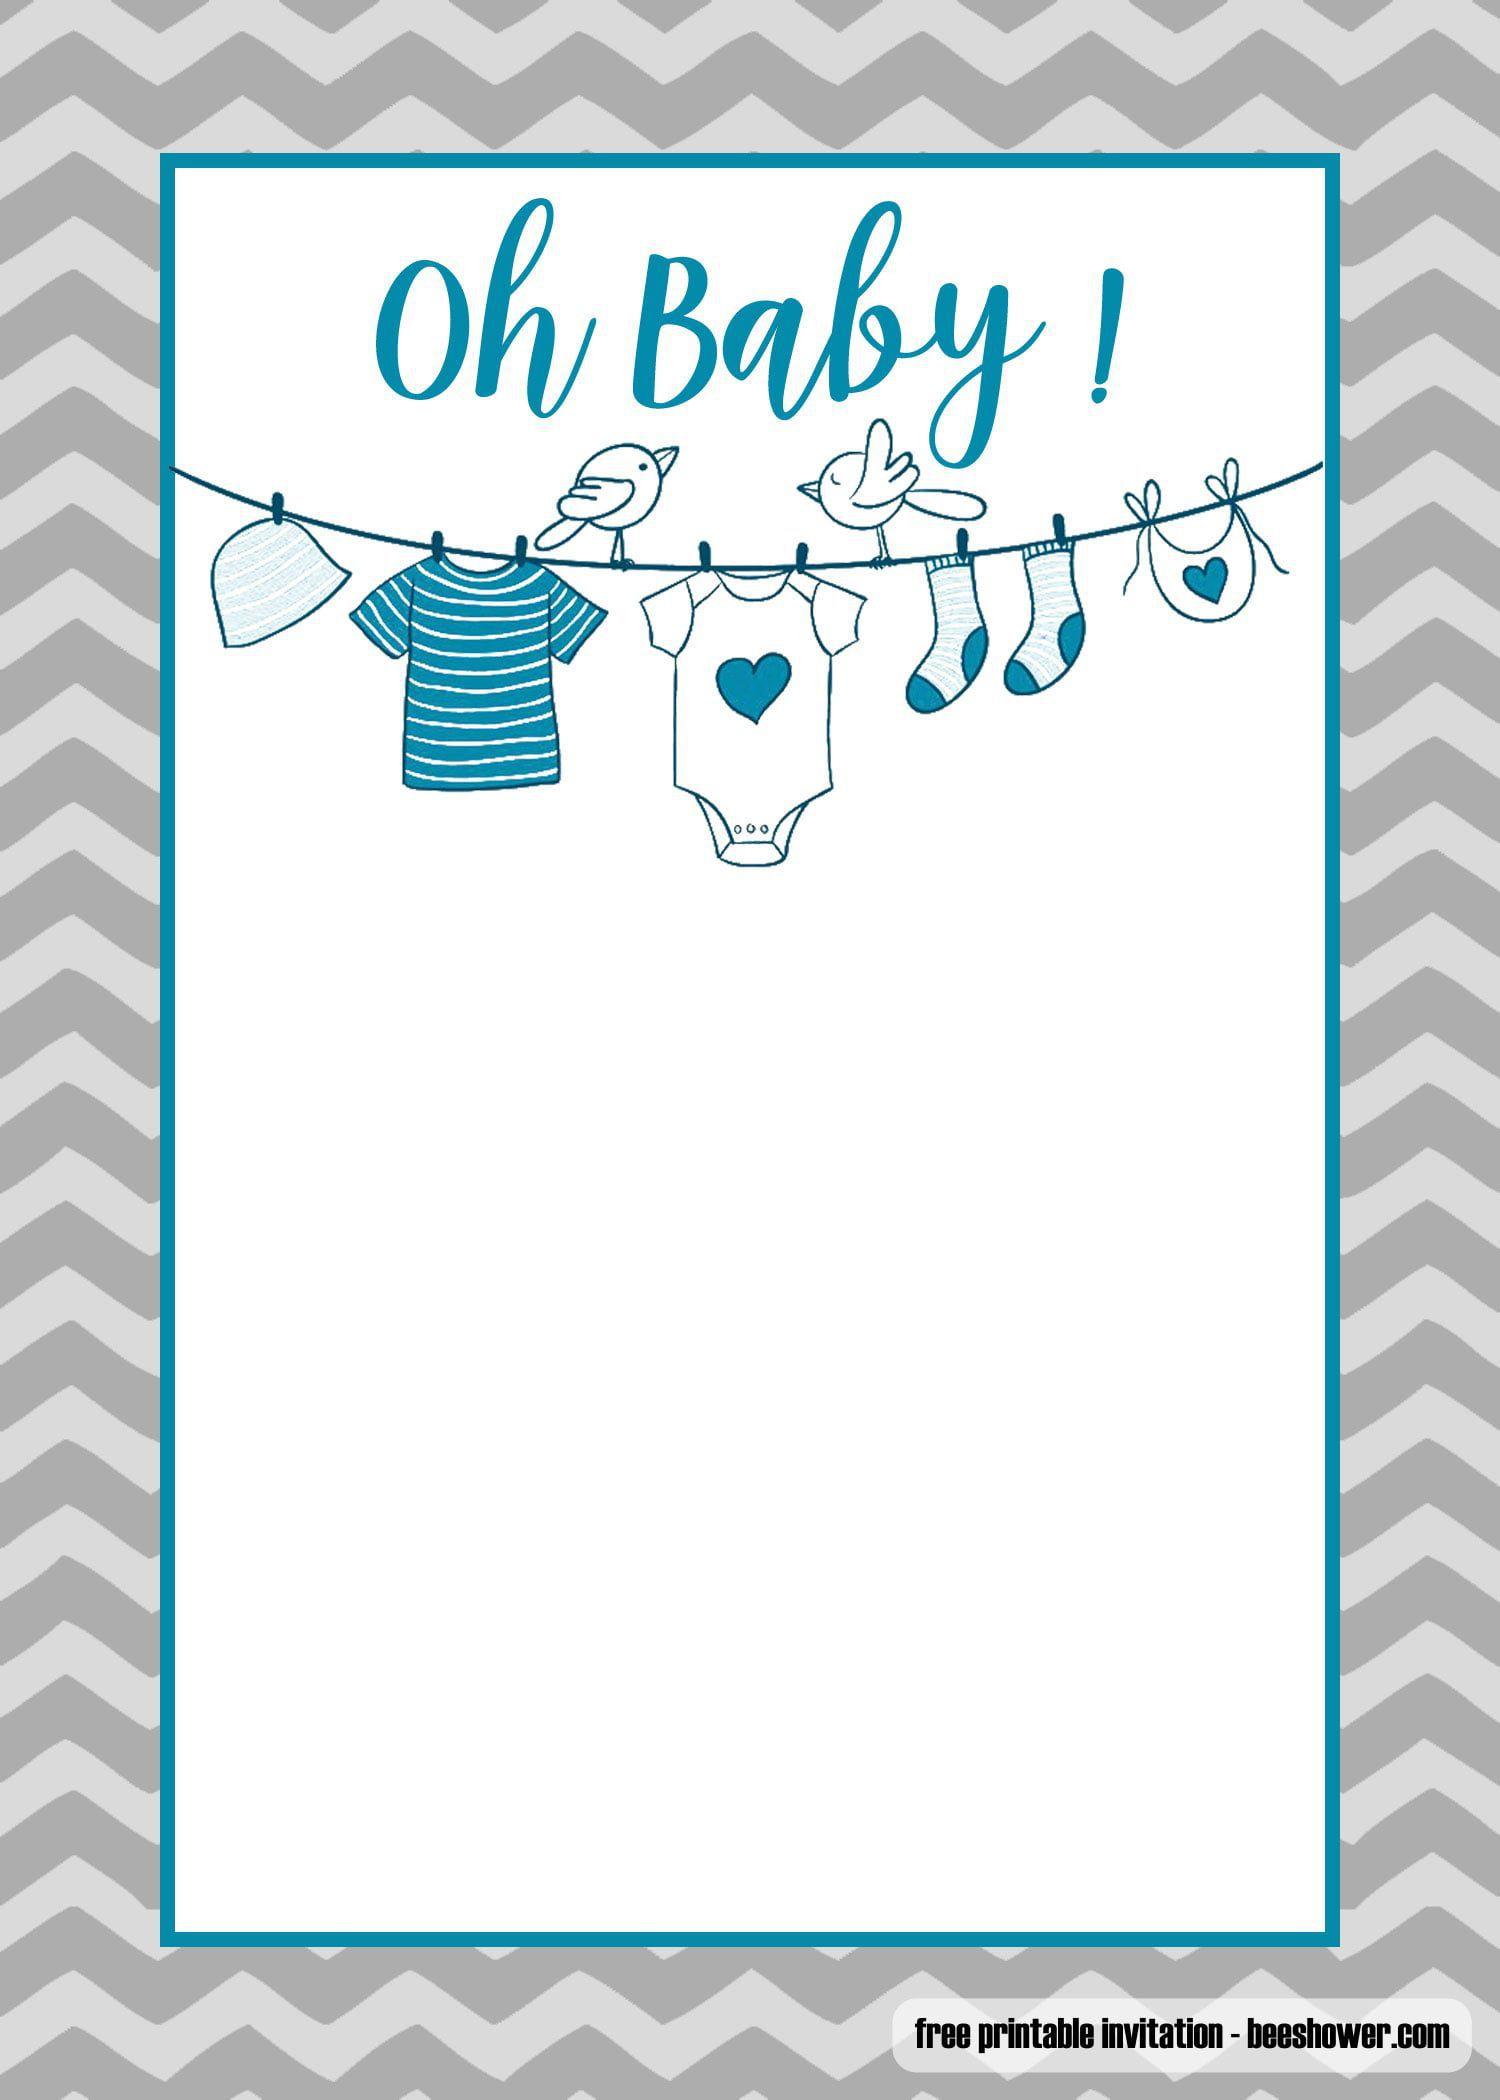 008 Impressive Free Editable Baby Shower Invitation Template For Word Sample  MicrosoftFull